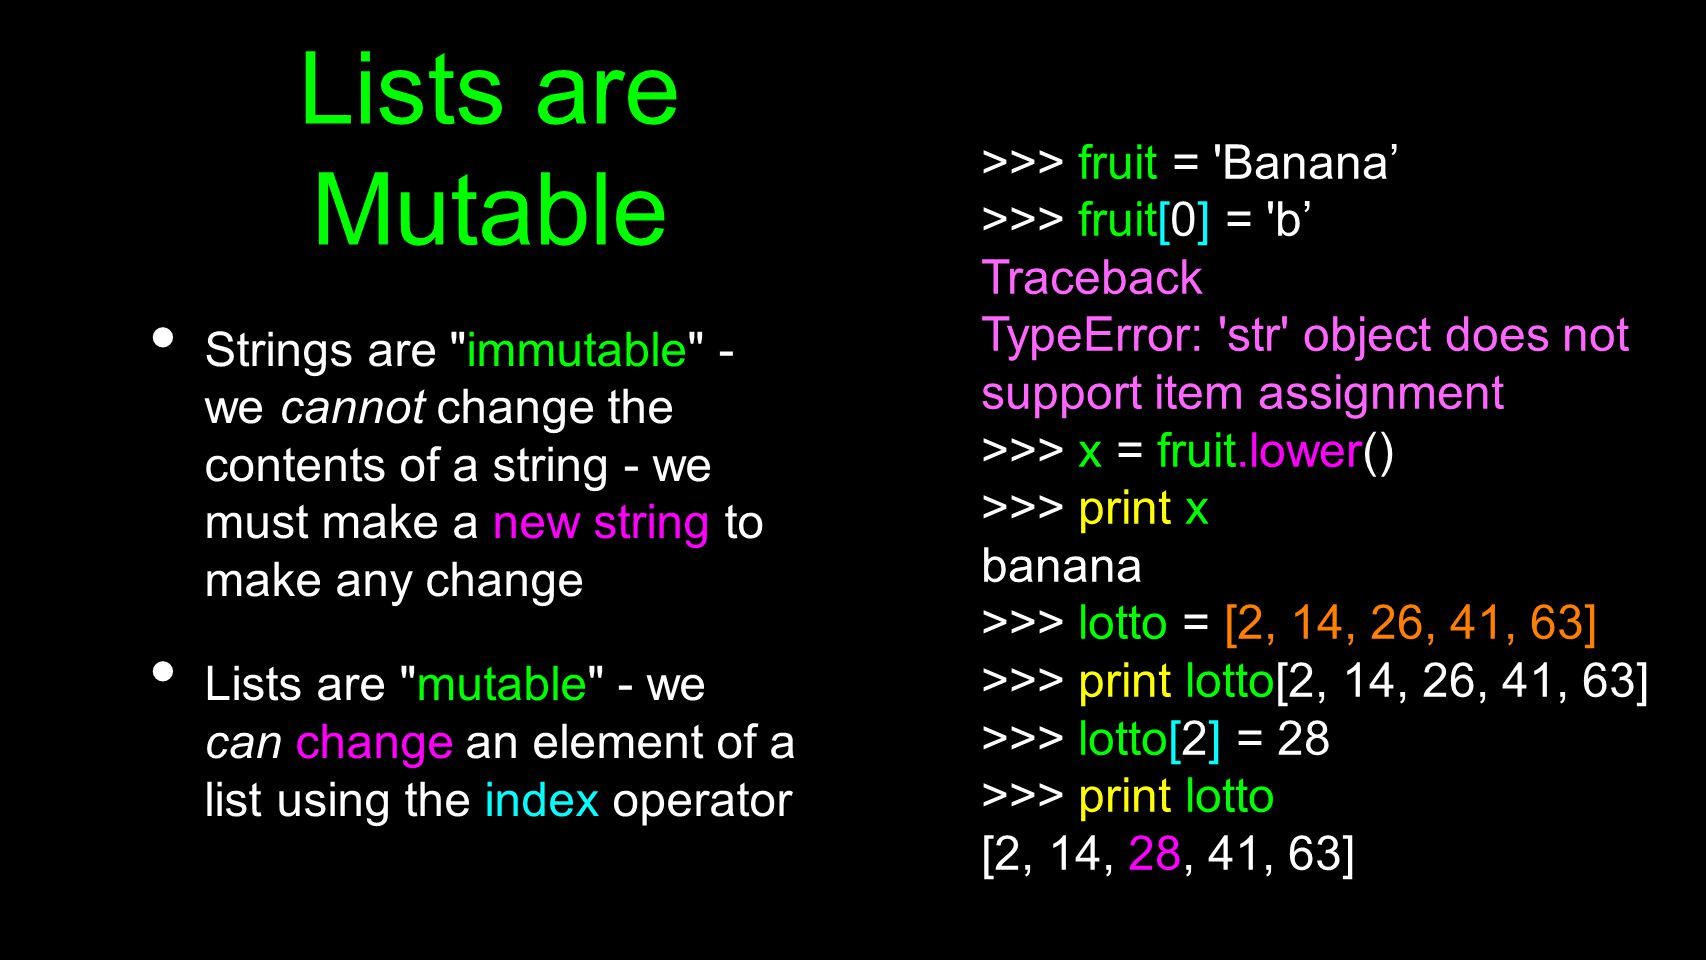 Lists are Mutable >>> fruit = Banana'